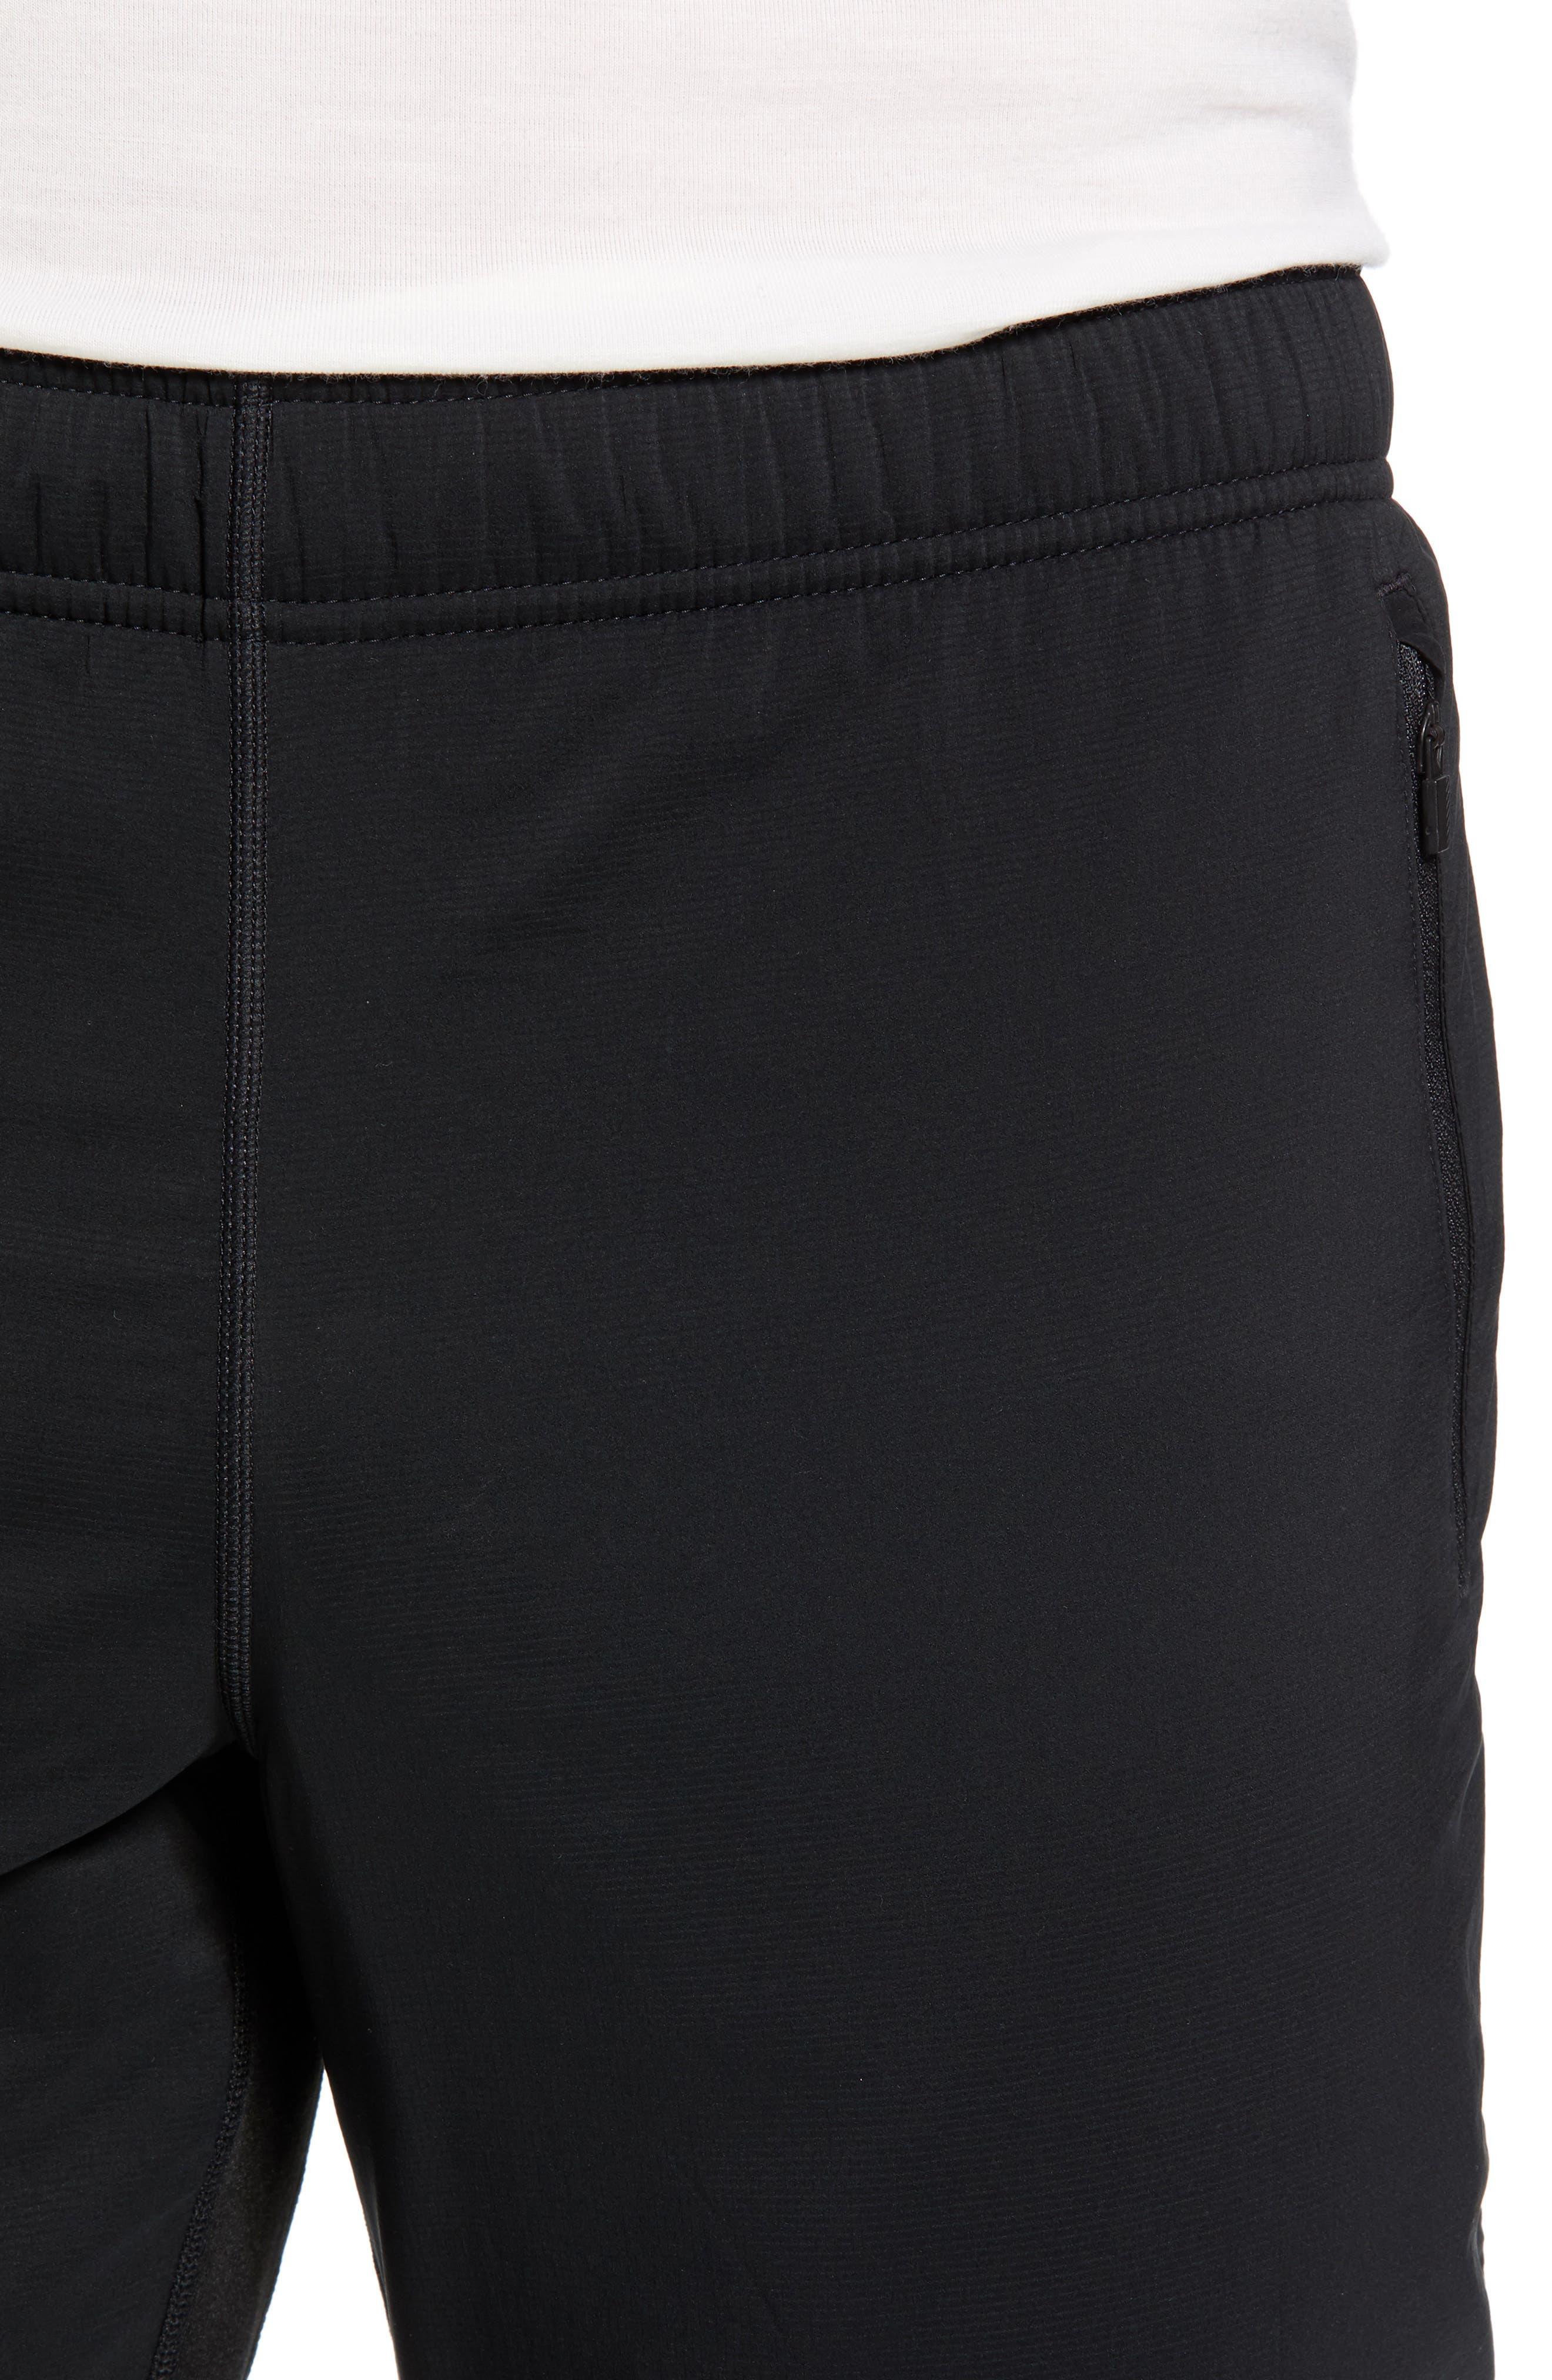 Tech Trainer Hybrid Sport Pants,                             Alternate thumbnail 4, color,                             BLACK